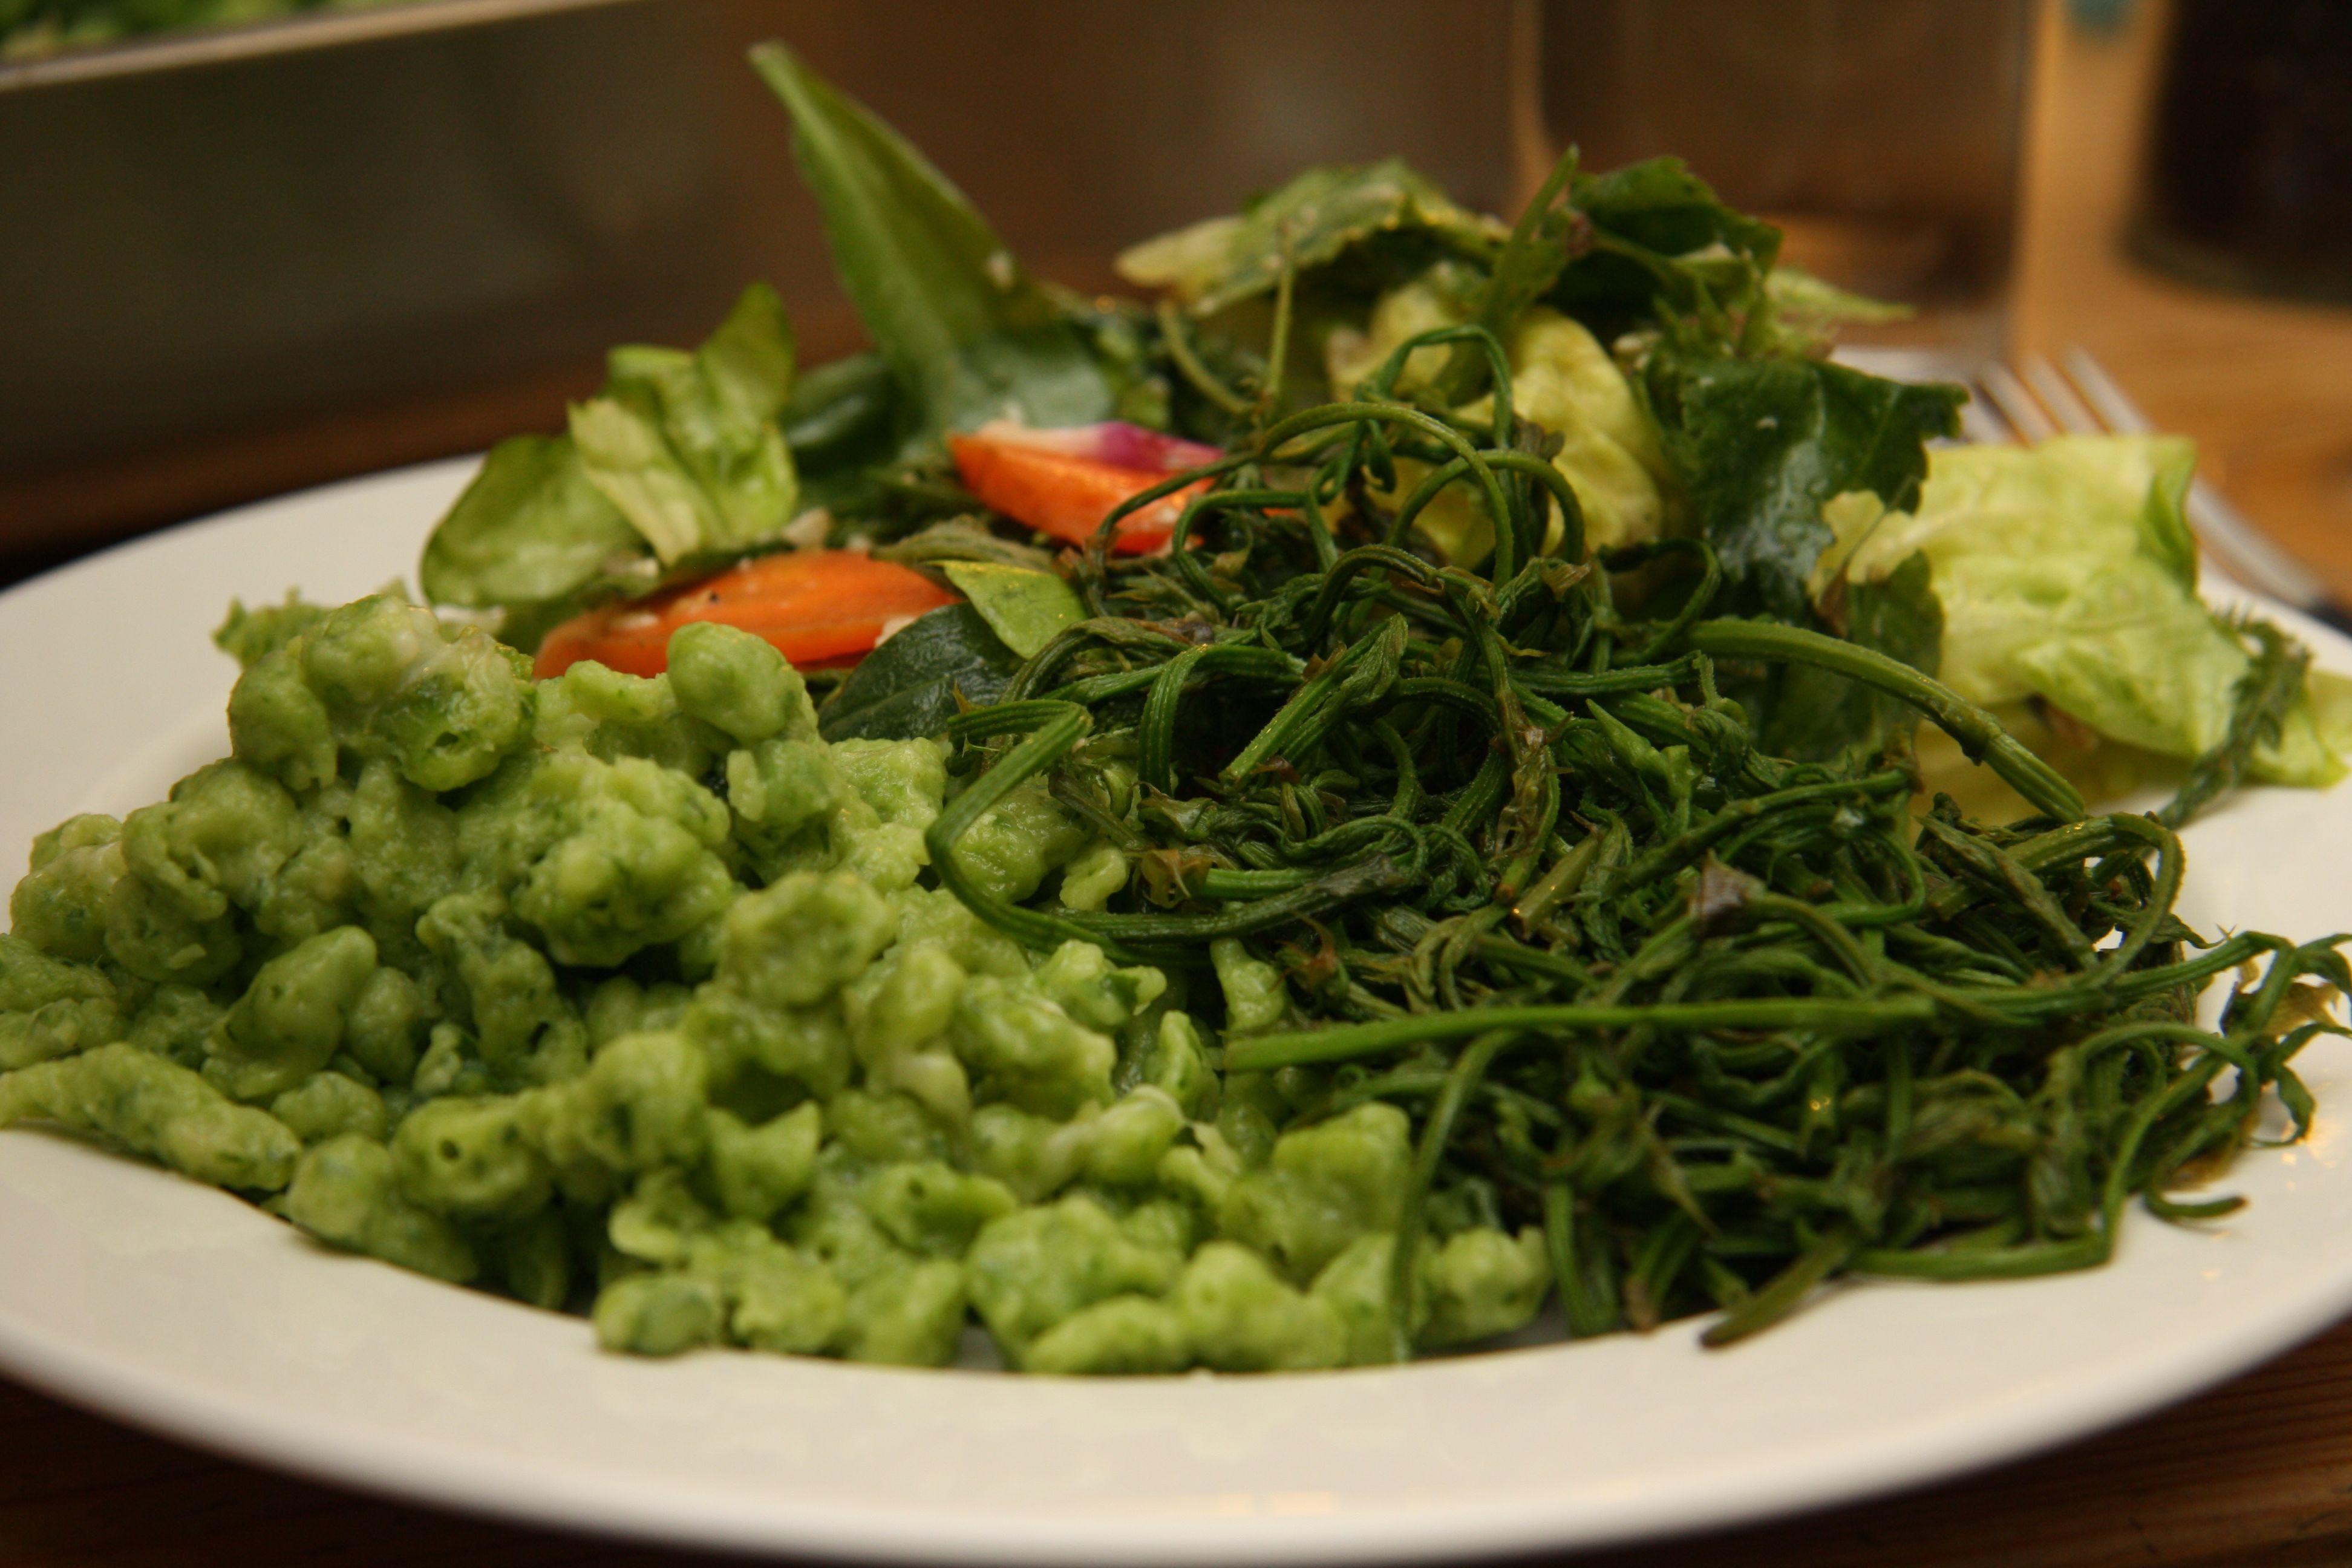 apfel avocado salat mit sauerampfer vinaigrette rezepte suchen. Black Bedroom Furniture Sets. Home Design Ideas